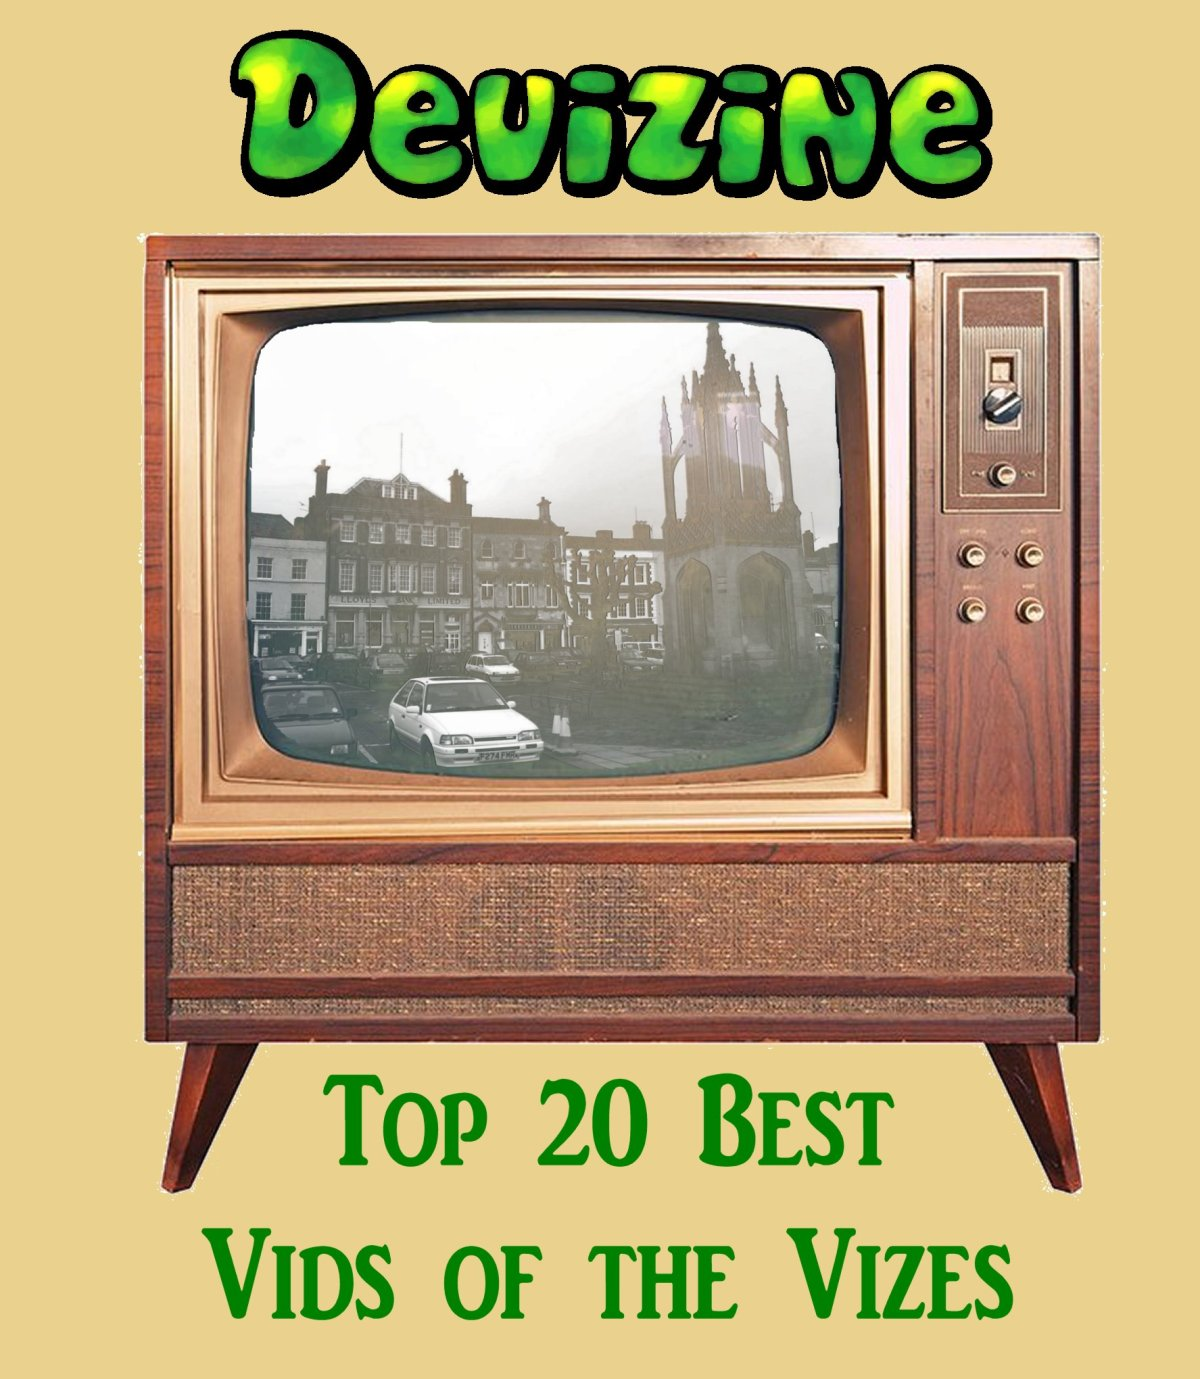 Top Twenty Best Vids of theVizes!